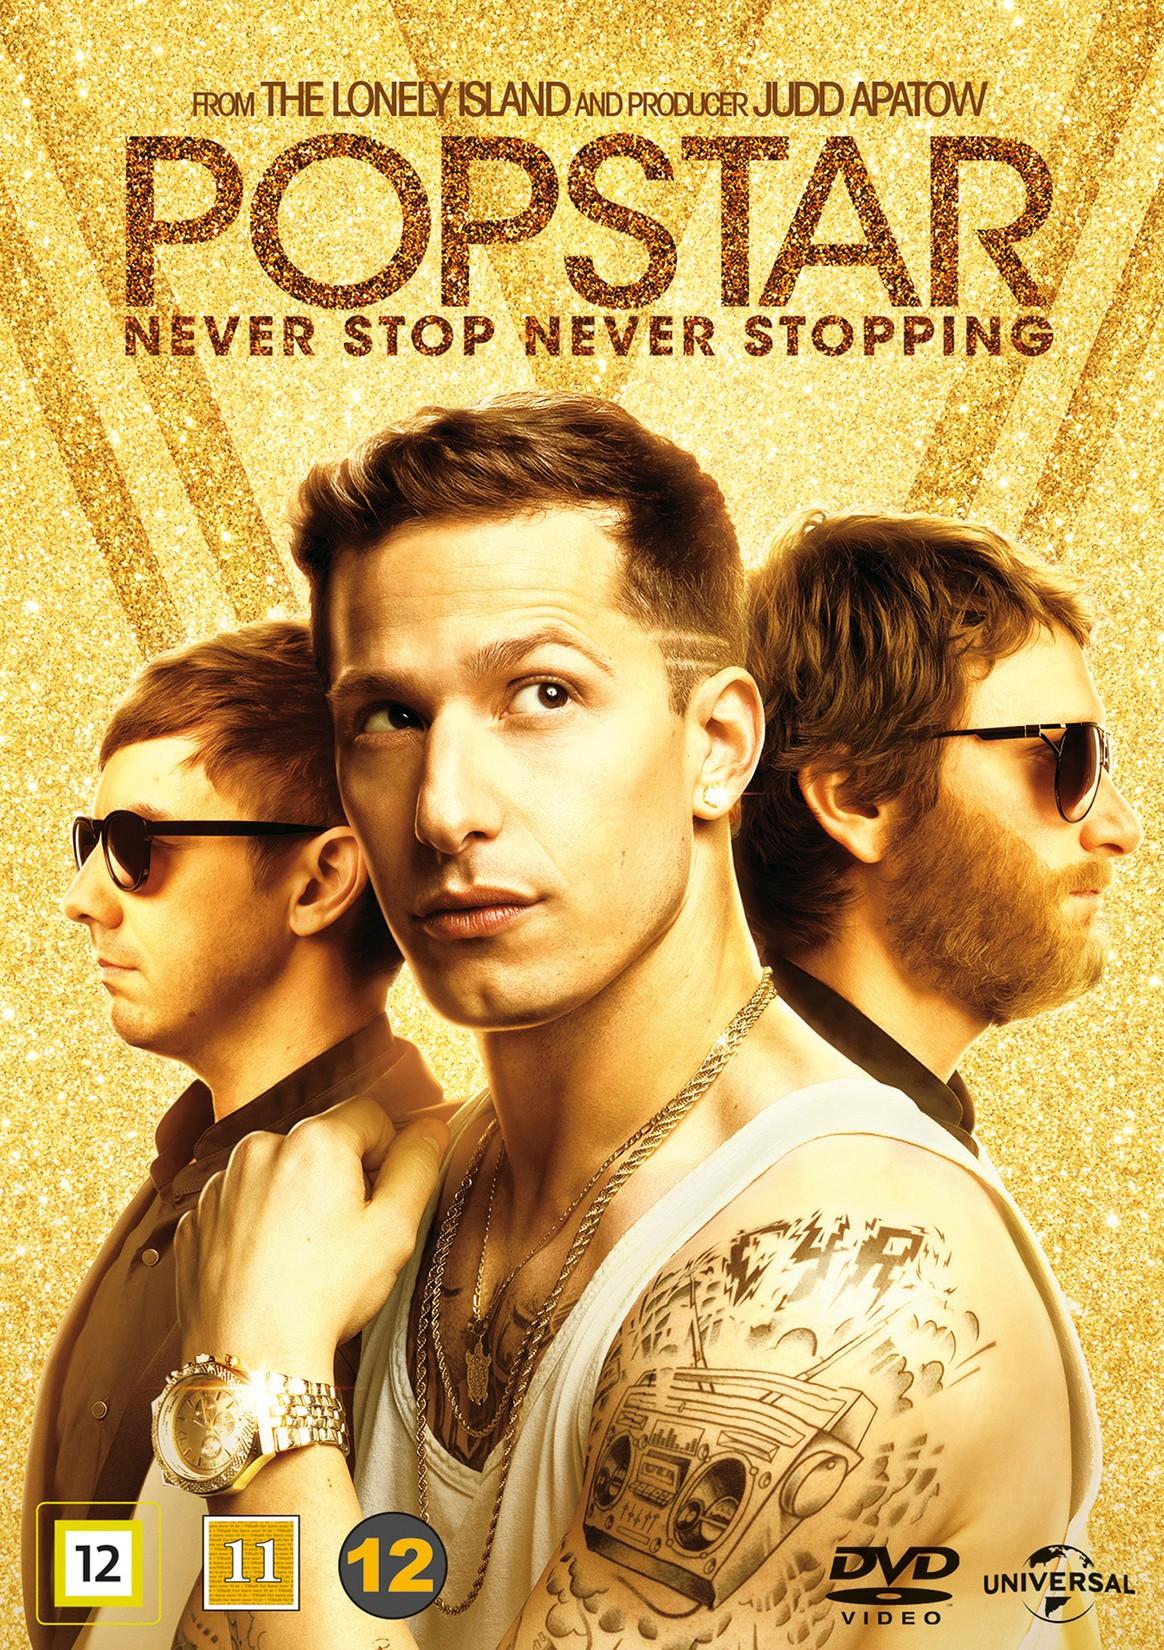 'Popstar: Never Stop Never Stopping'